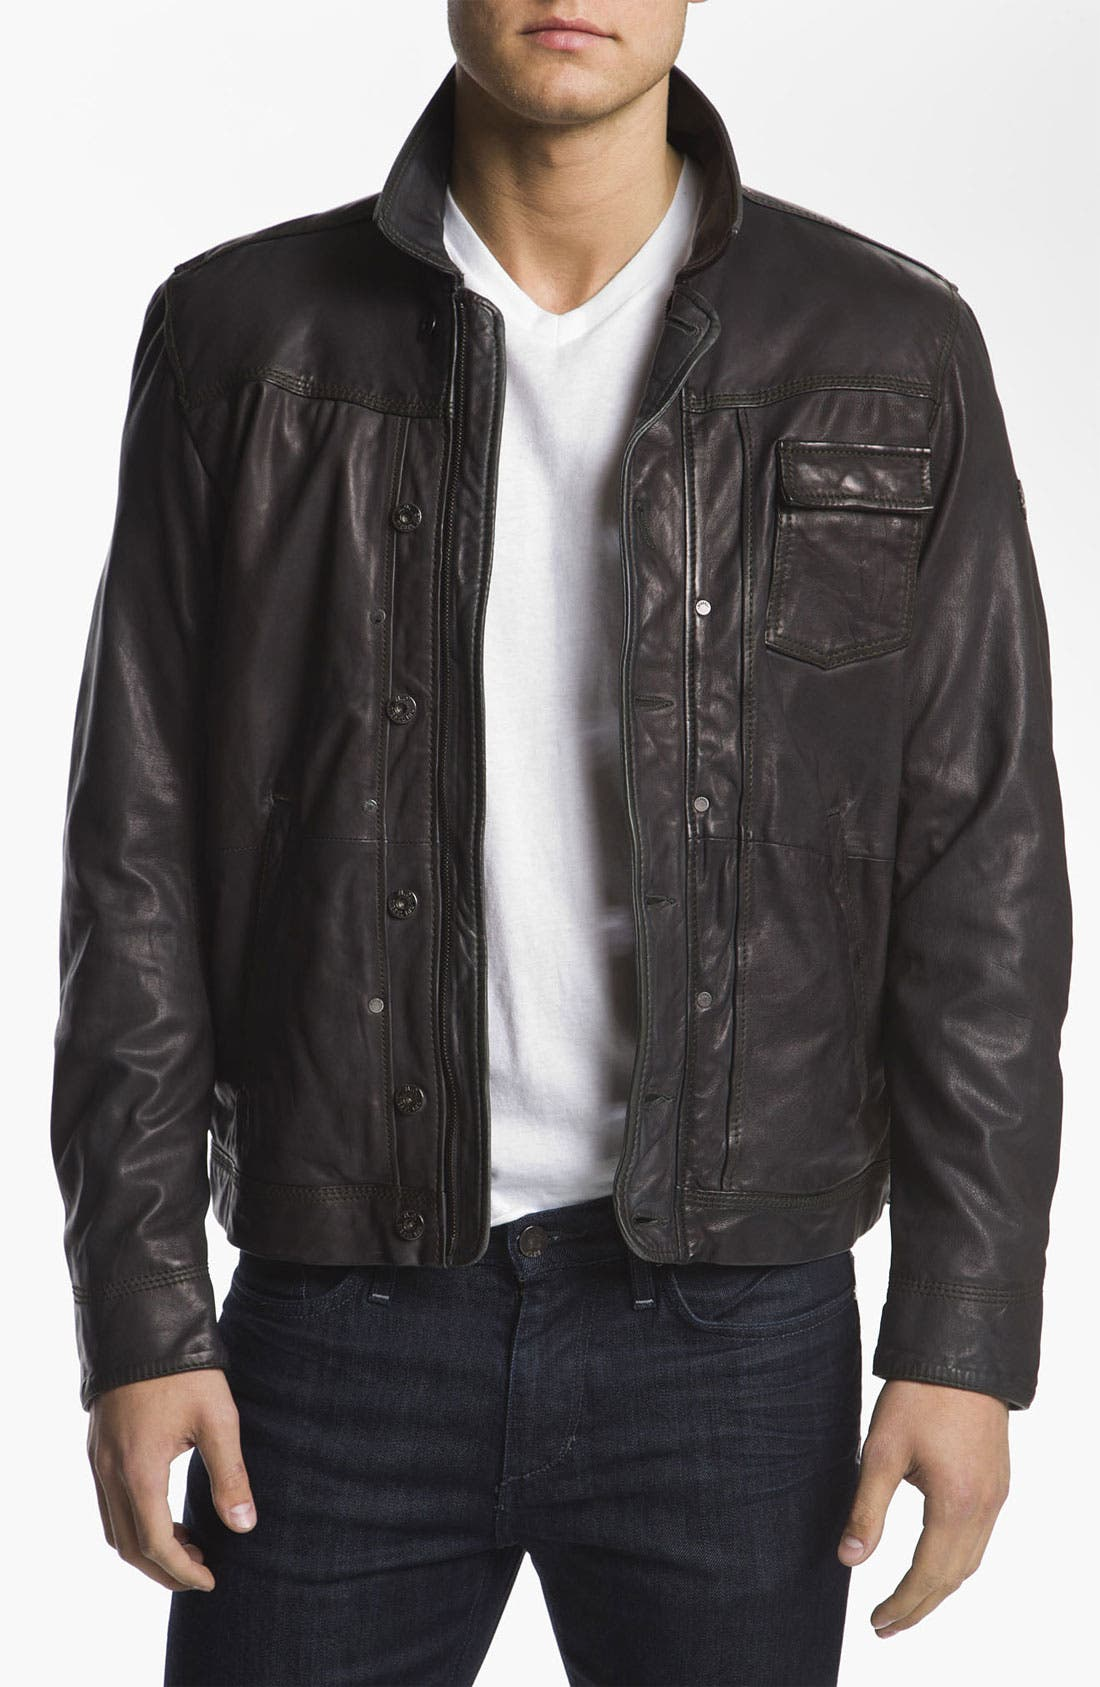 Alternate Image 1 Selected - DIESEL® 'Laurence' Leather Jacket